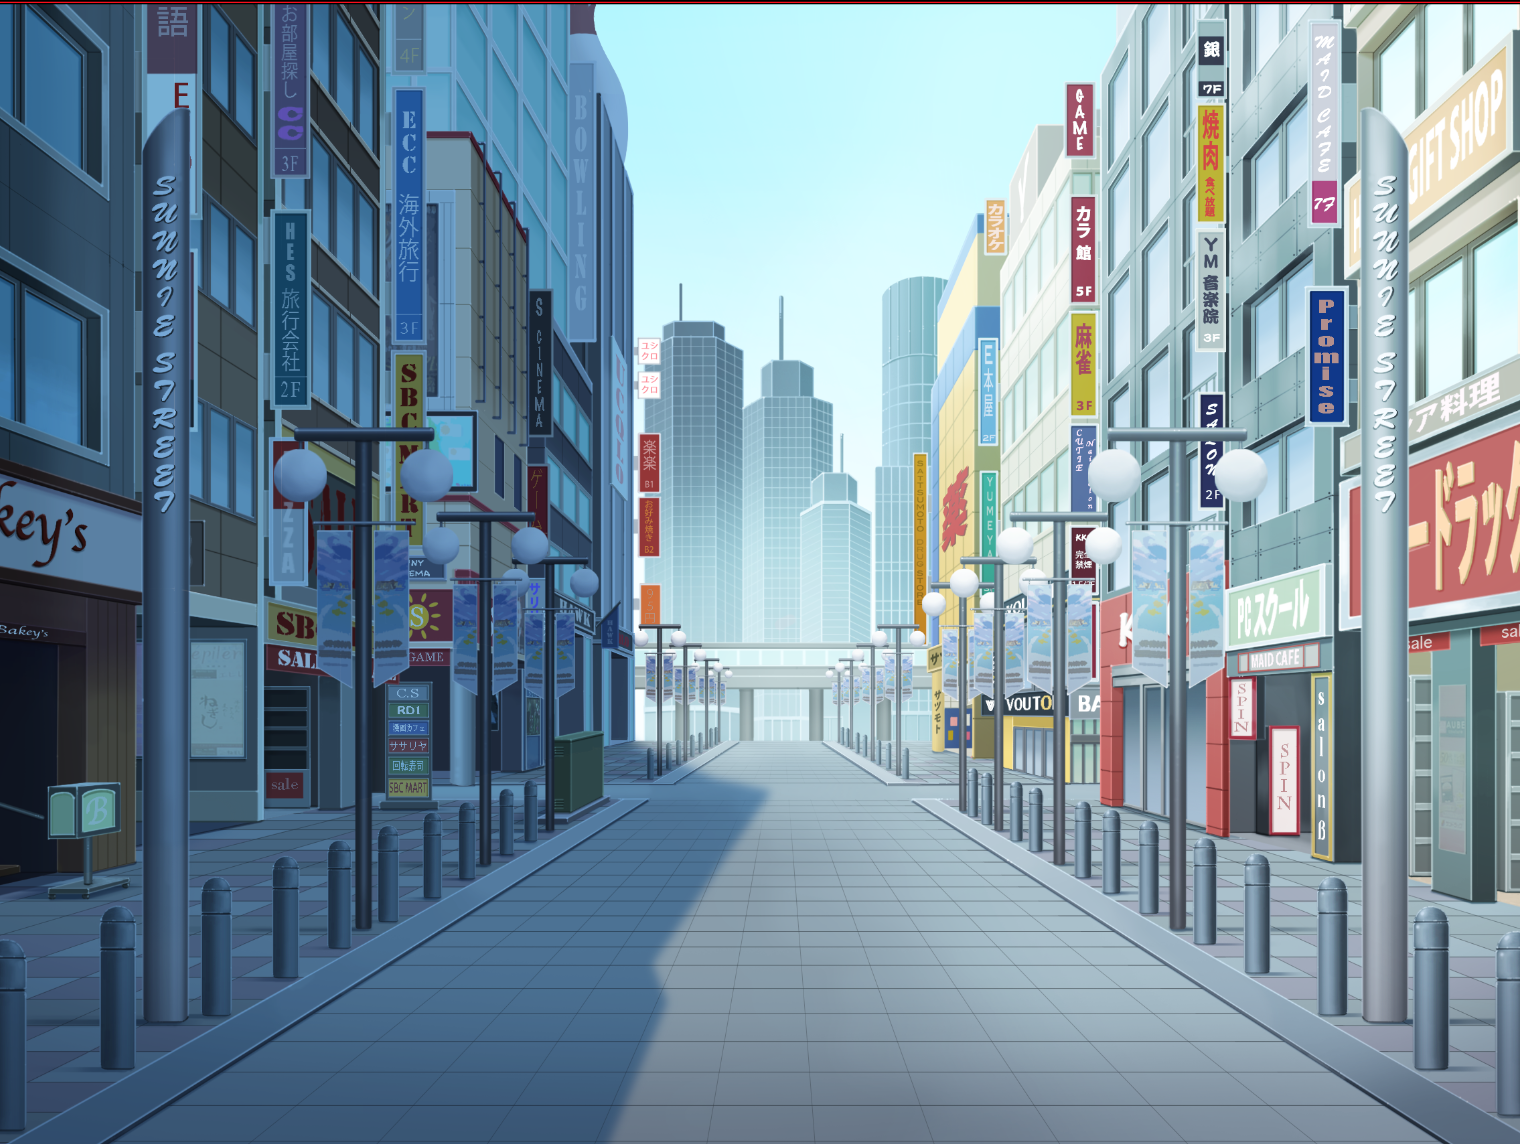 ApplicationGamesBG_ikebukuro Street